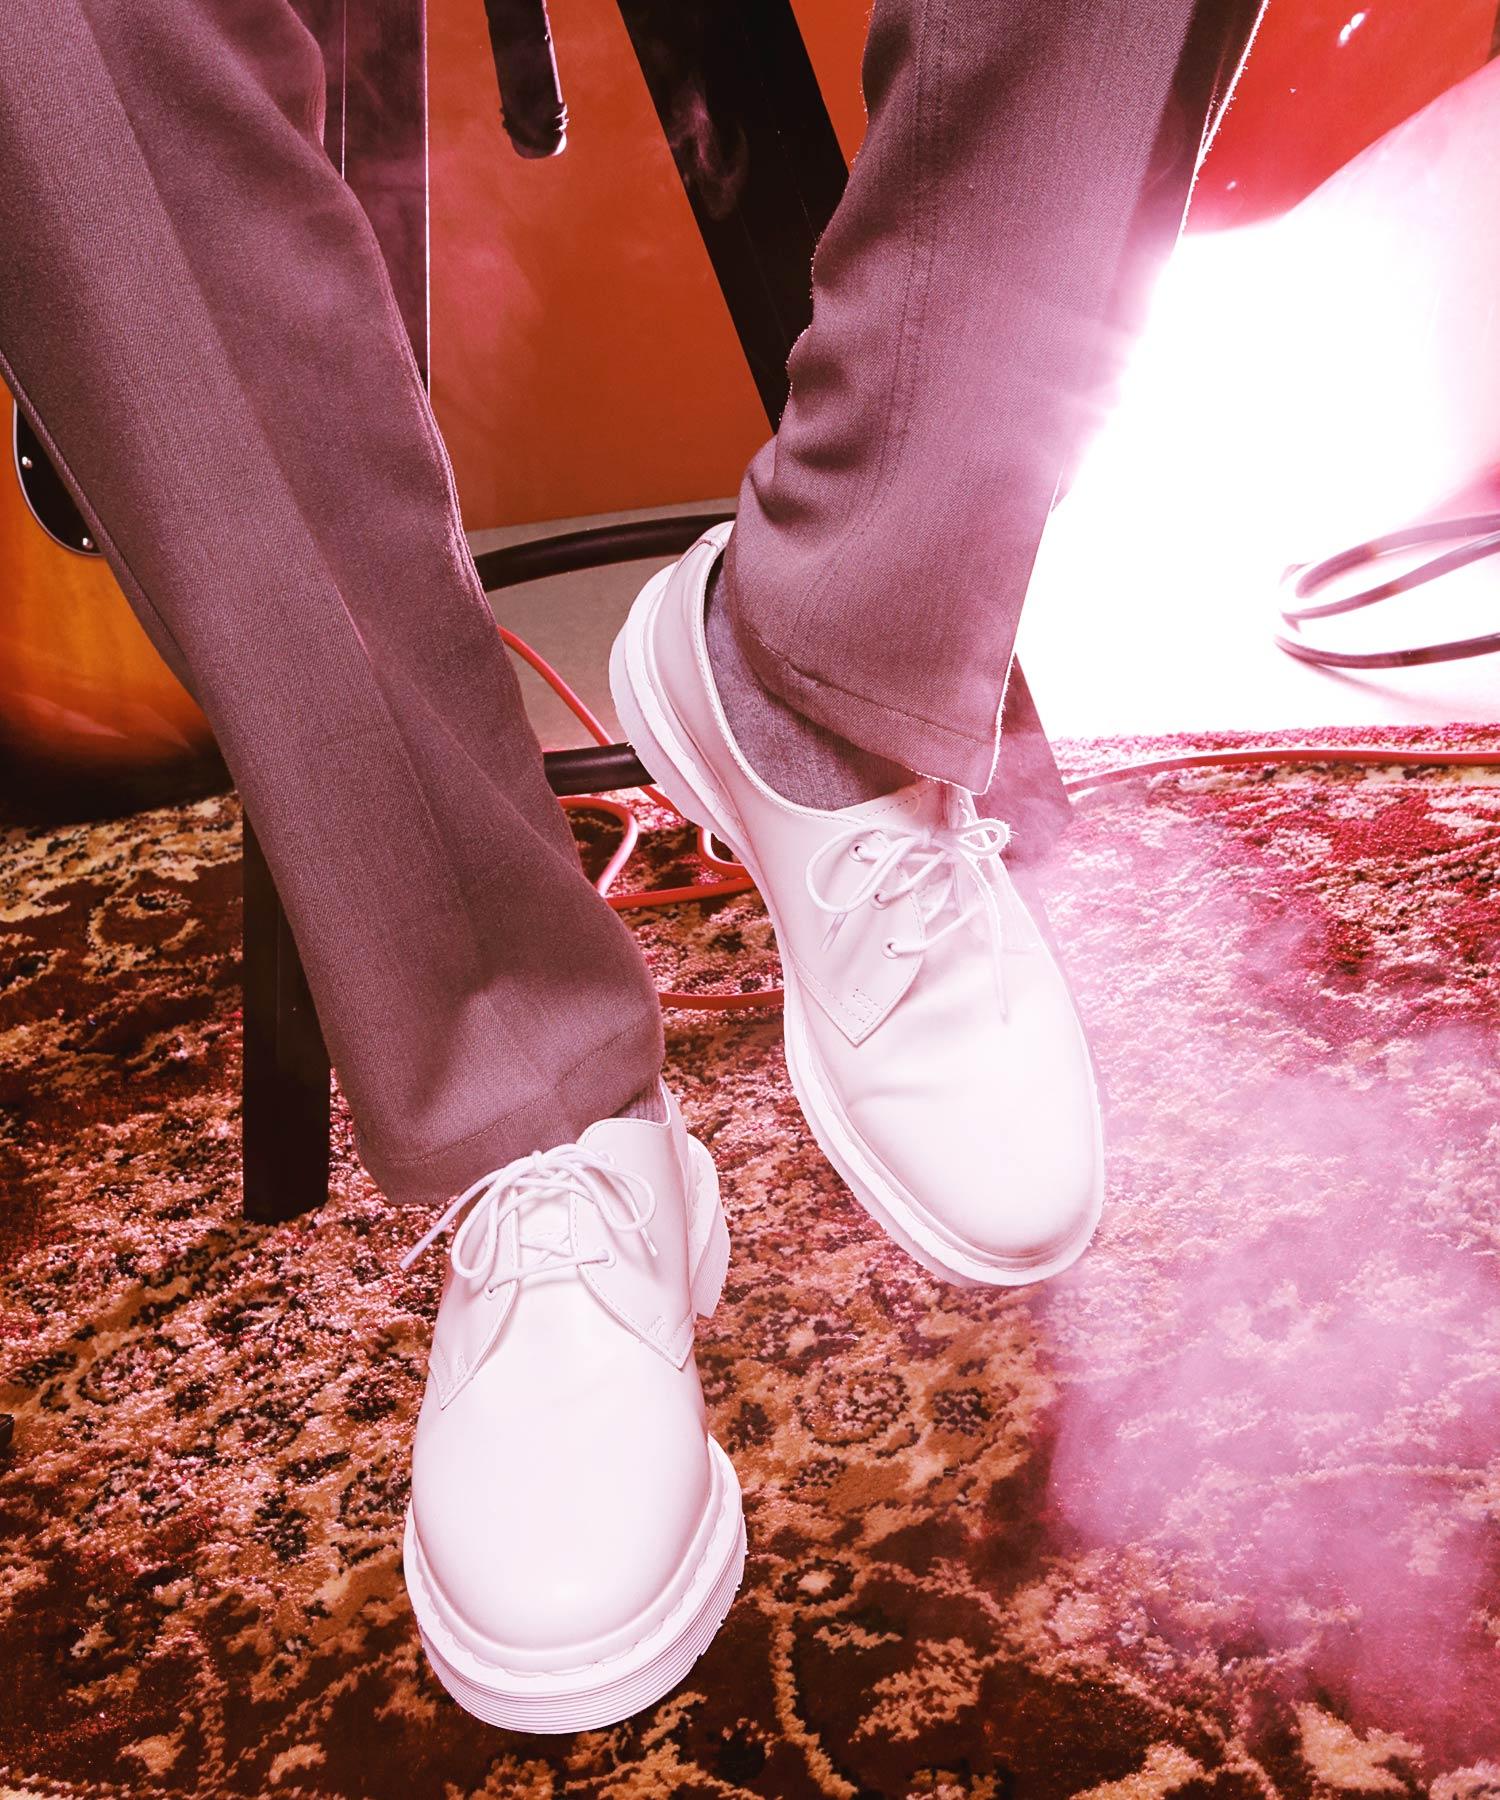 Dr.Martens / ドクターマーチン 1461 3EYE GIBSON SHOE 3ホール ギブソン シューズ ブーツ